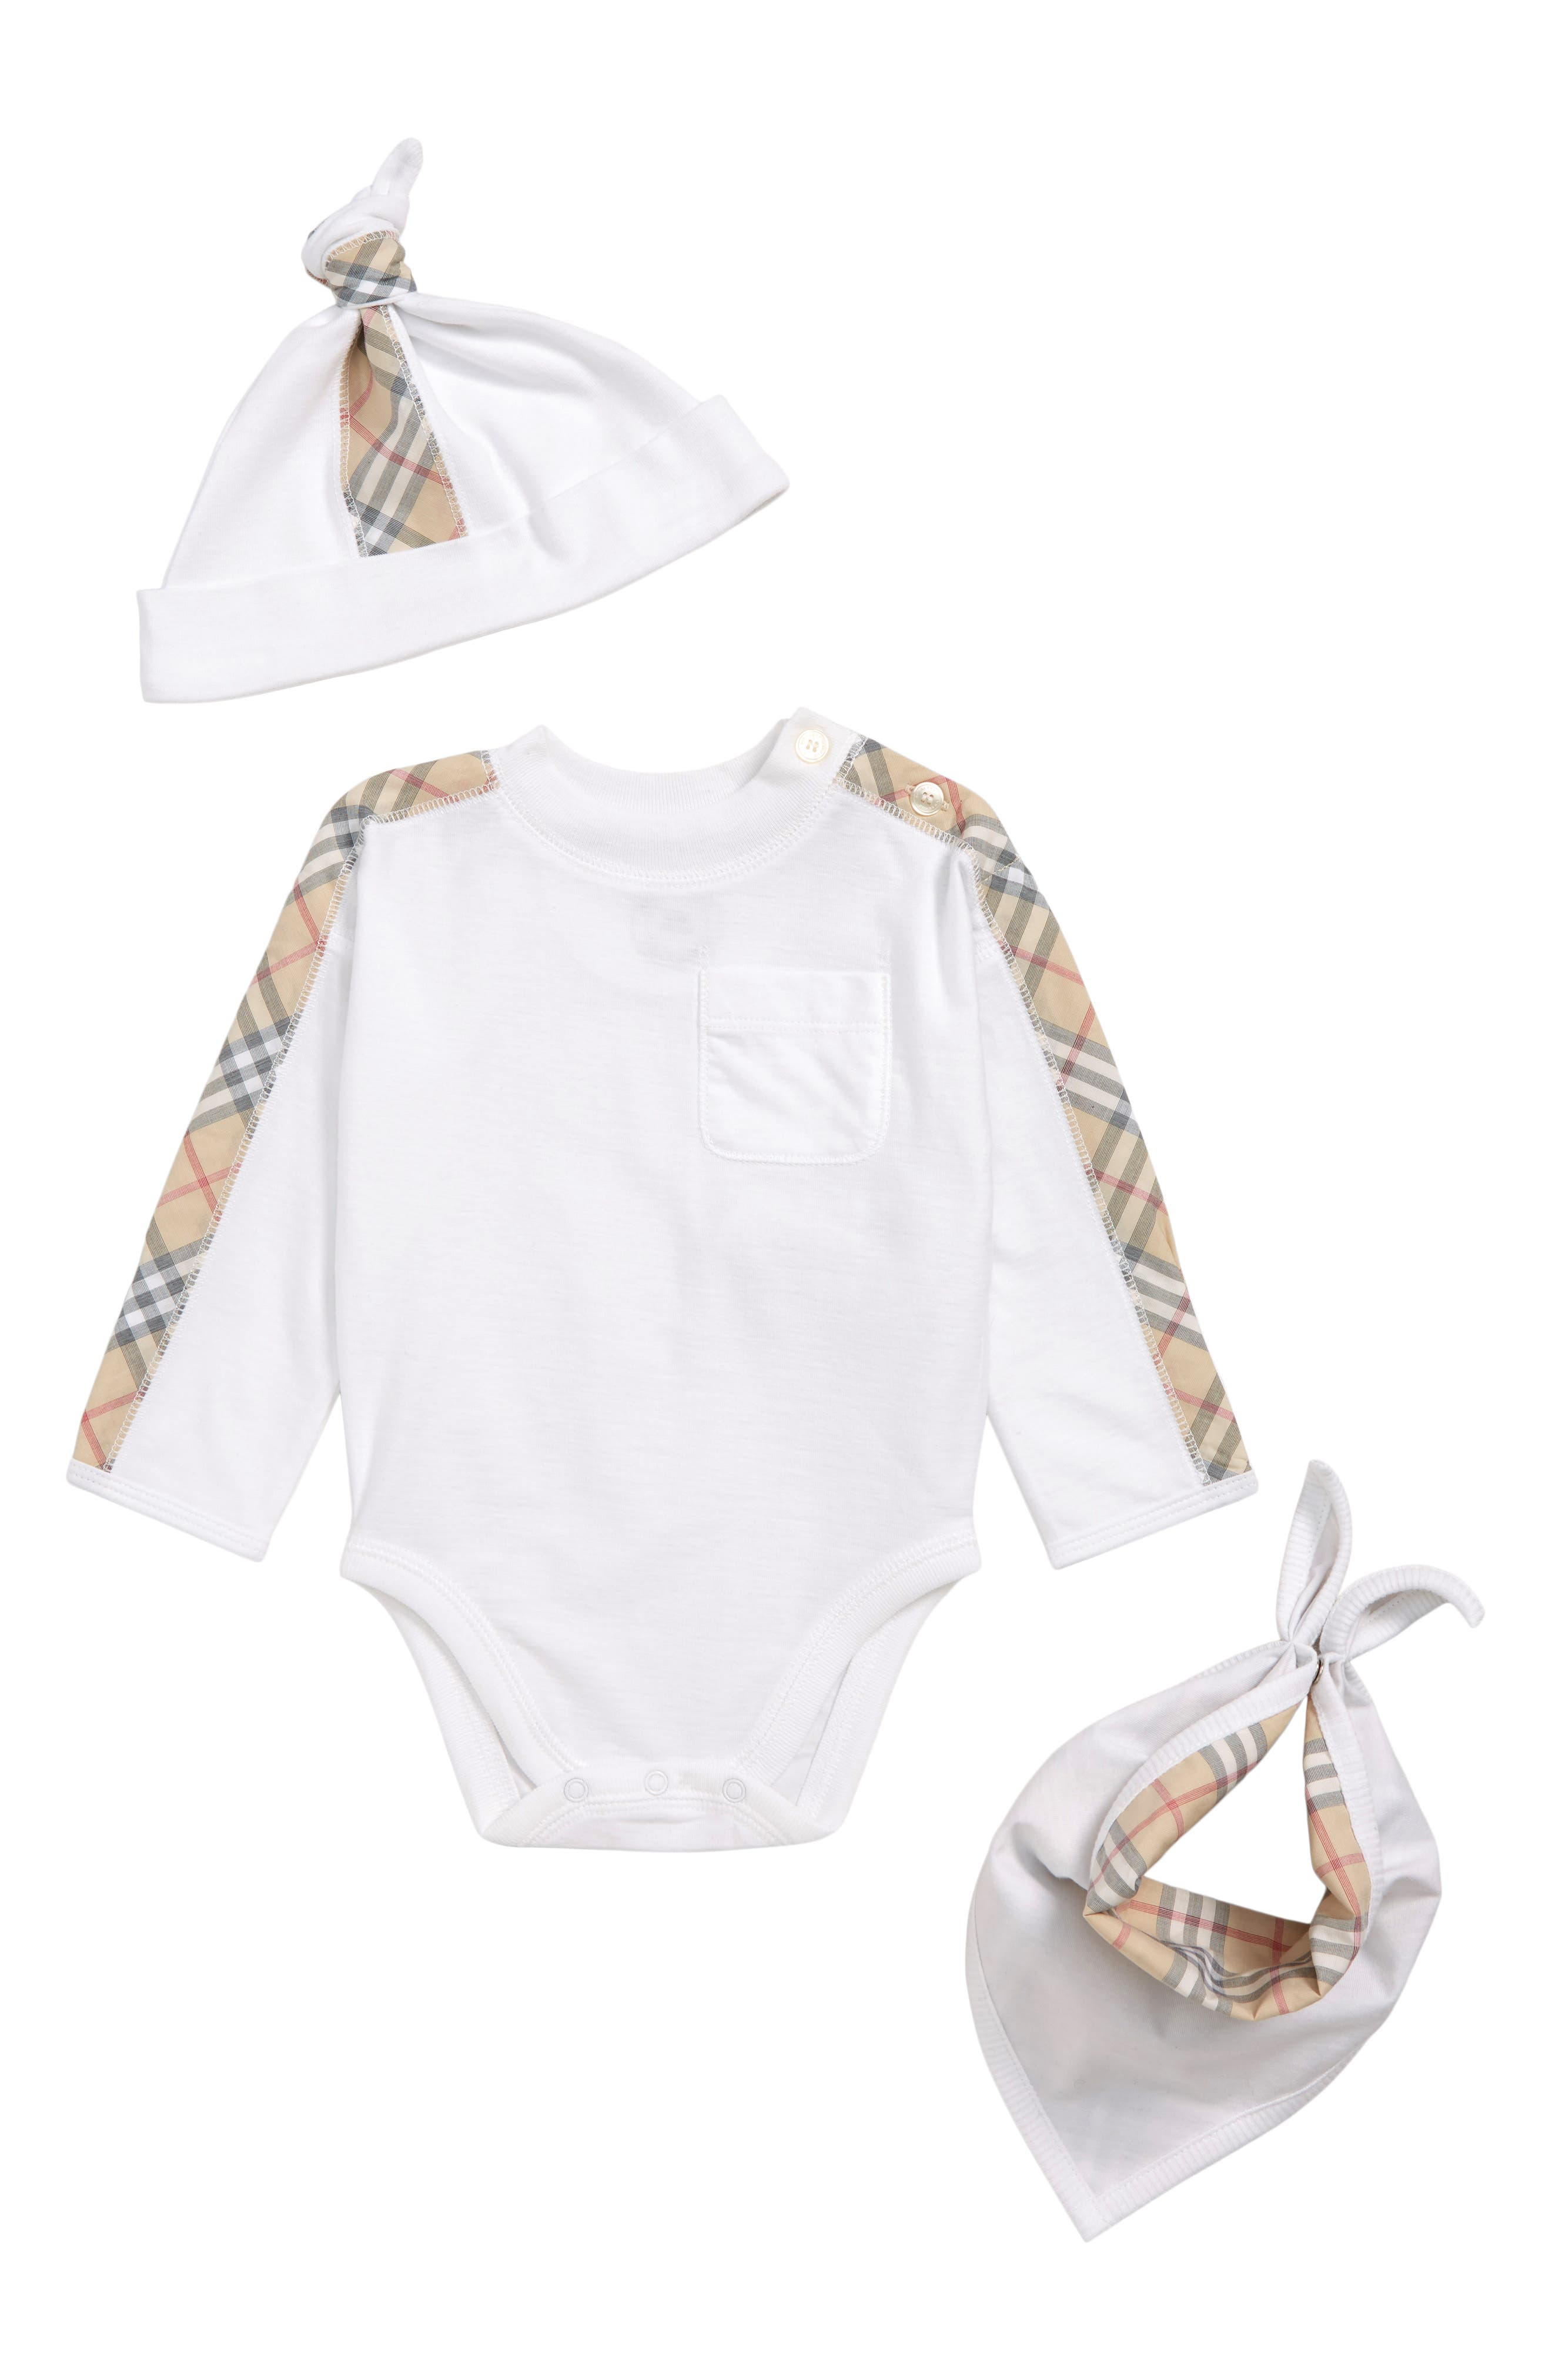 BURBERRY, Alby Bodysuit, Hat & Bib Set, Main thumbnail 1, color, WHITE